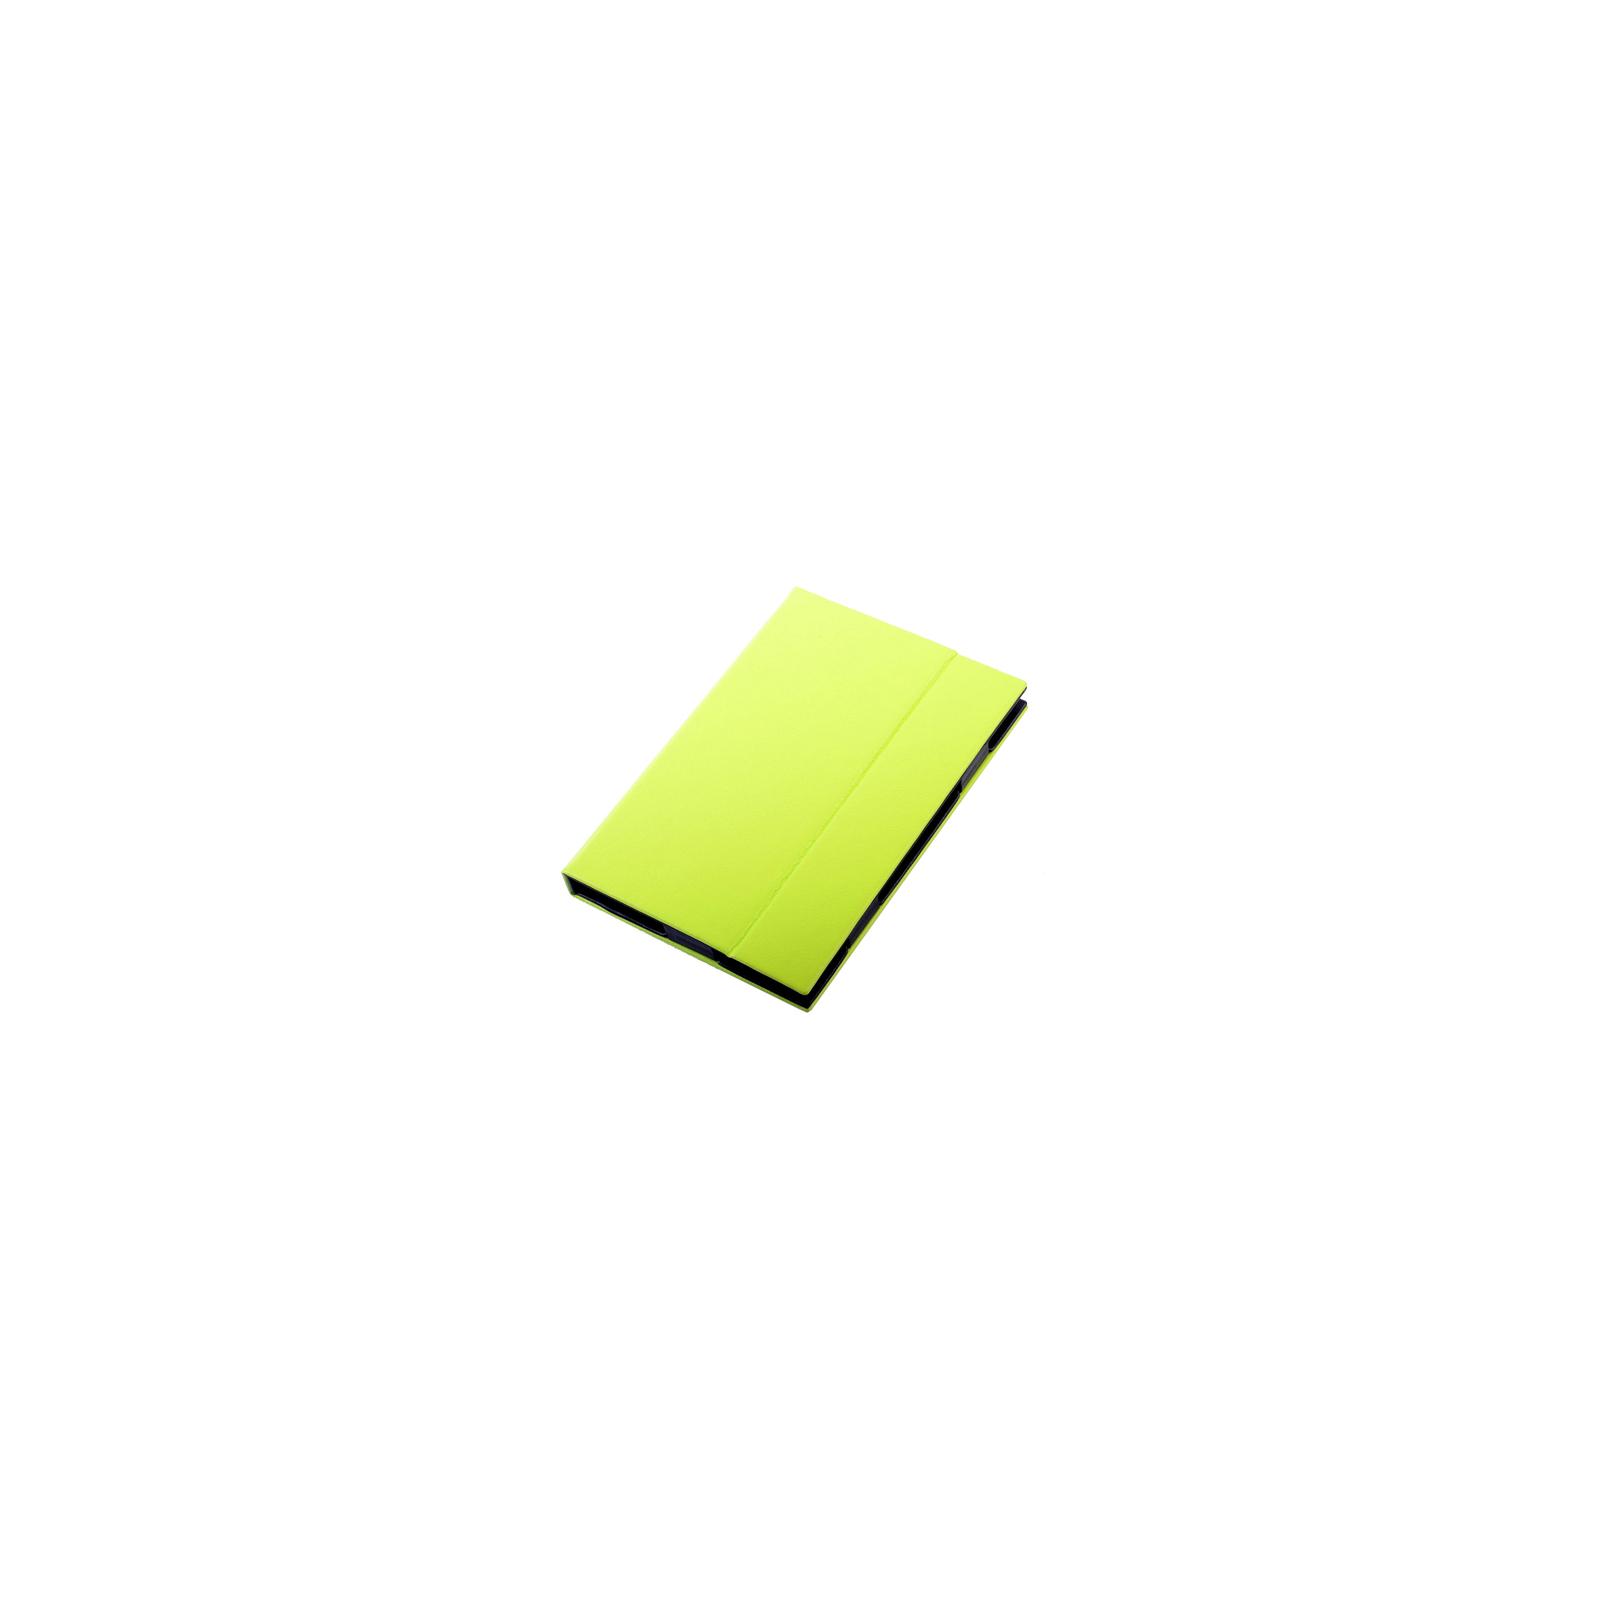 Чехол для планшета Vento 9 Desire Bright - lime